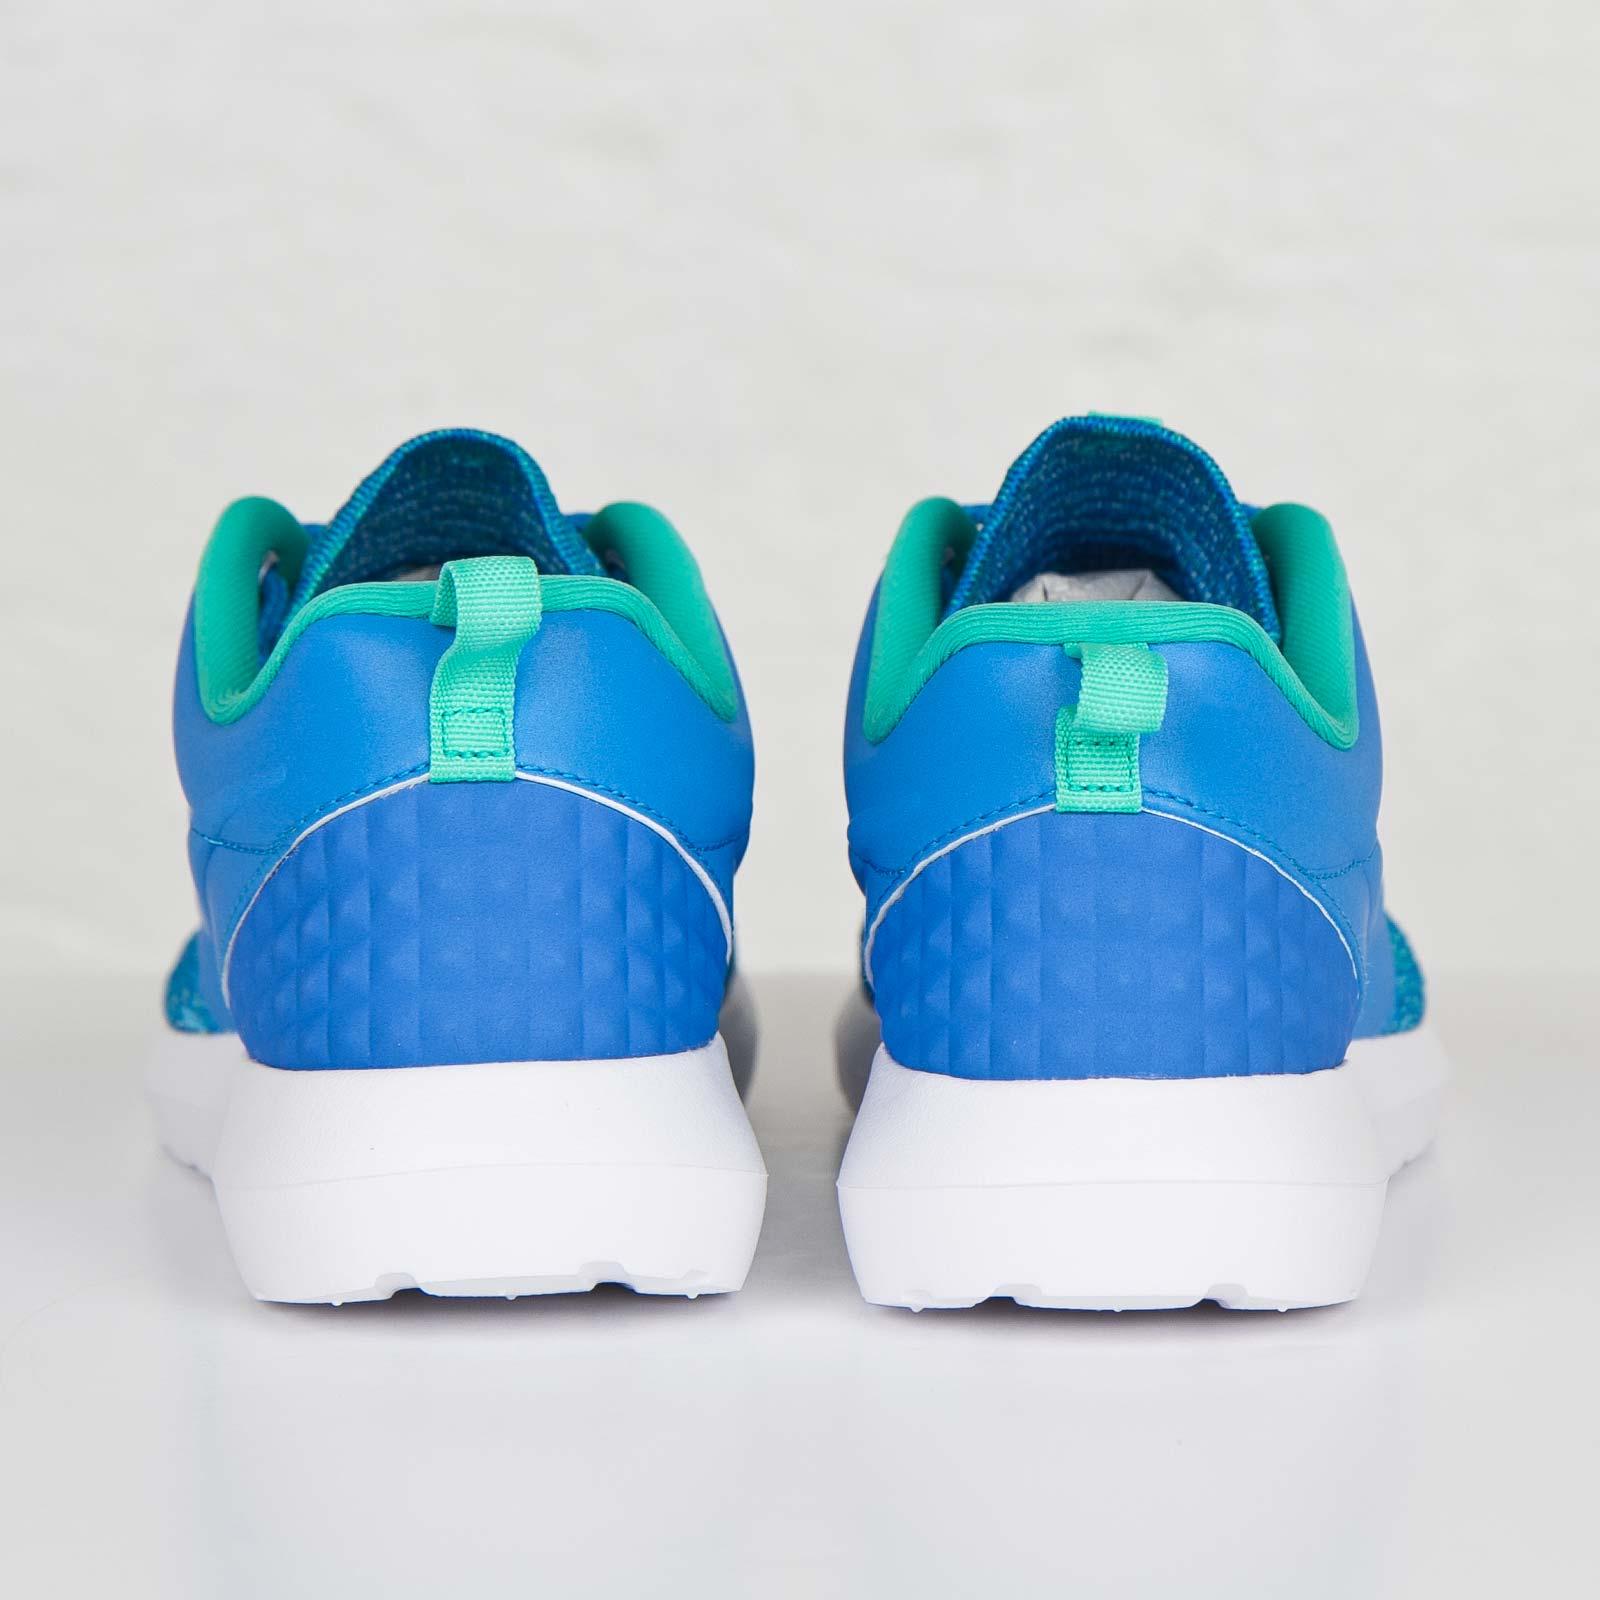 d75c5a8a7543 Nike Roshe NM Flyknit Premium - 746825-400 - Sneakersnstuff ...